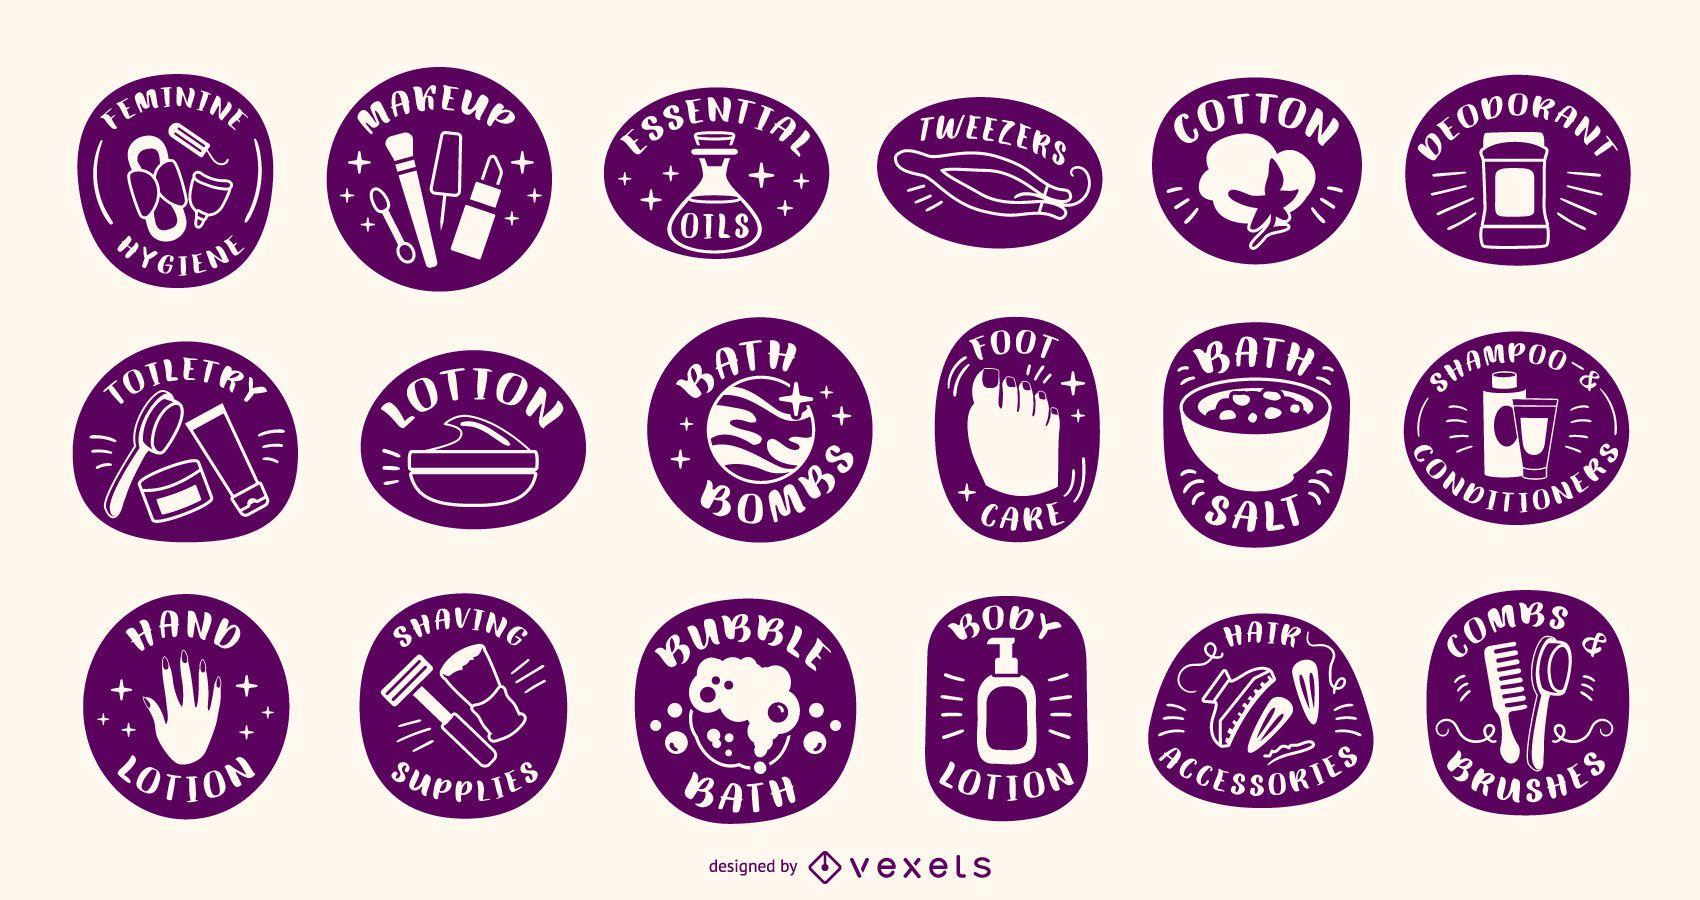 Conjunto de etiquetas de silhueta de produtos para banho